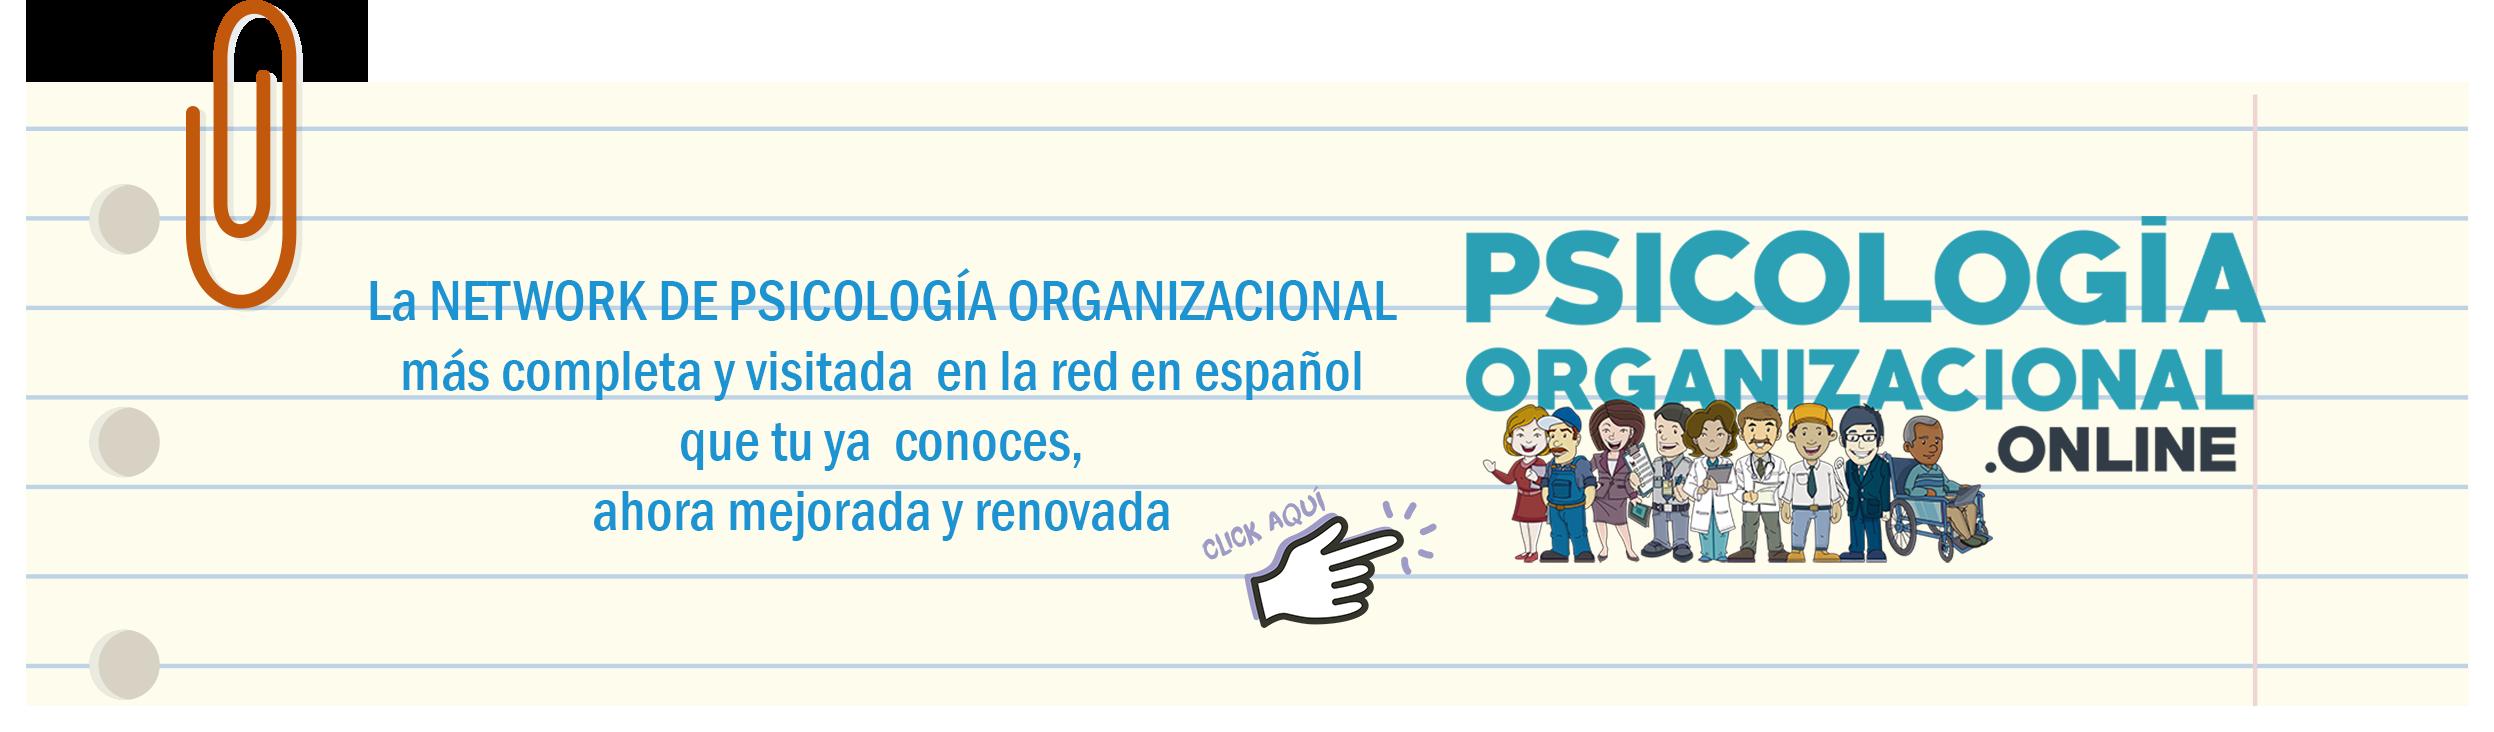 network_psicologia_organizacional_online